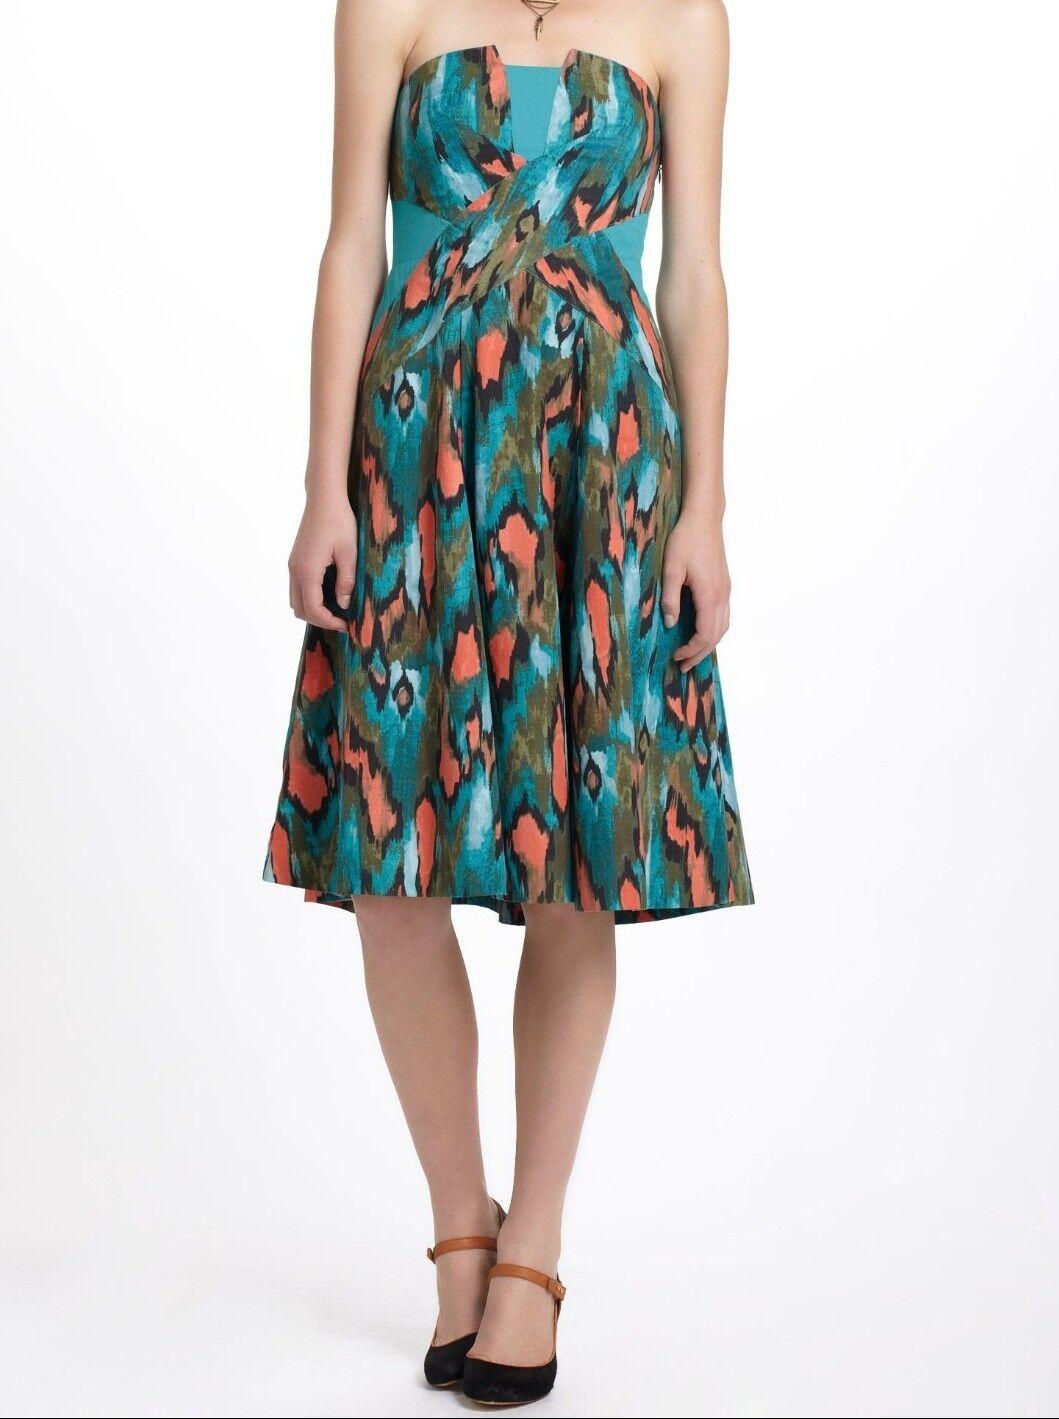 ANTHROPOLOGIE Green Painted Ikat Dress Sz 2 New